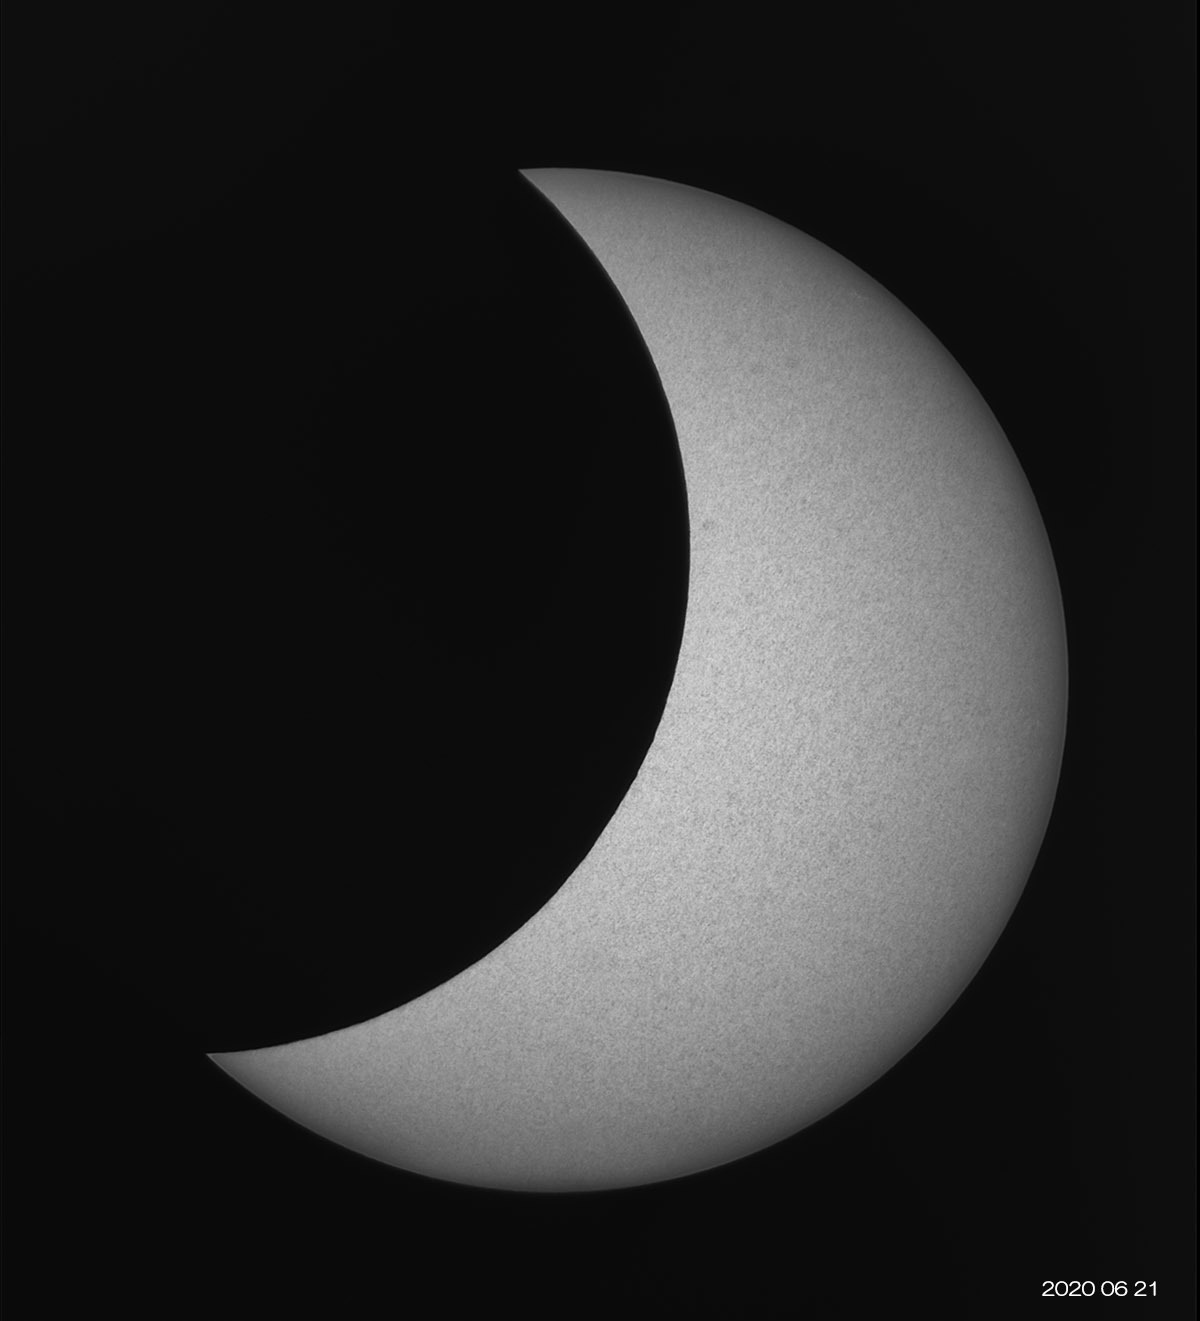 6月21日の太陽 部分日食_e0174091_22522395.jpg